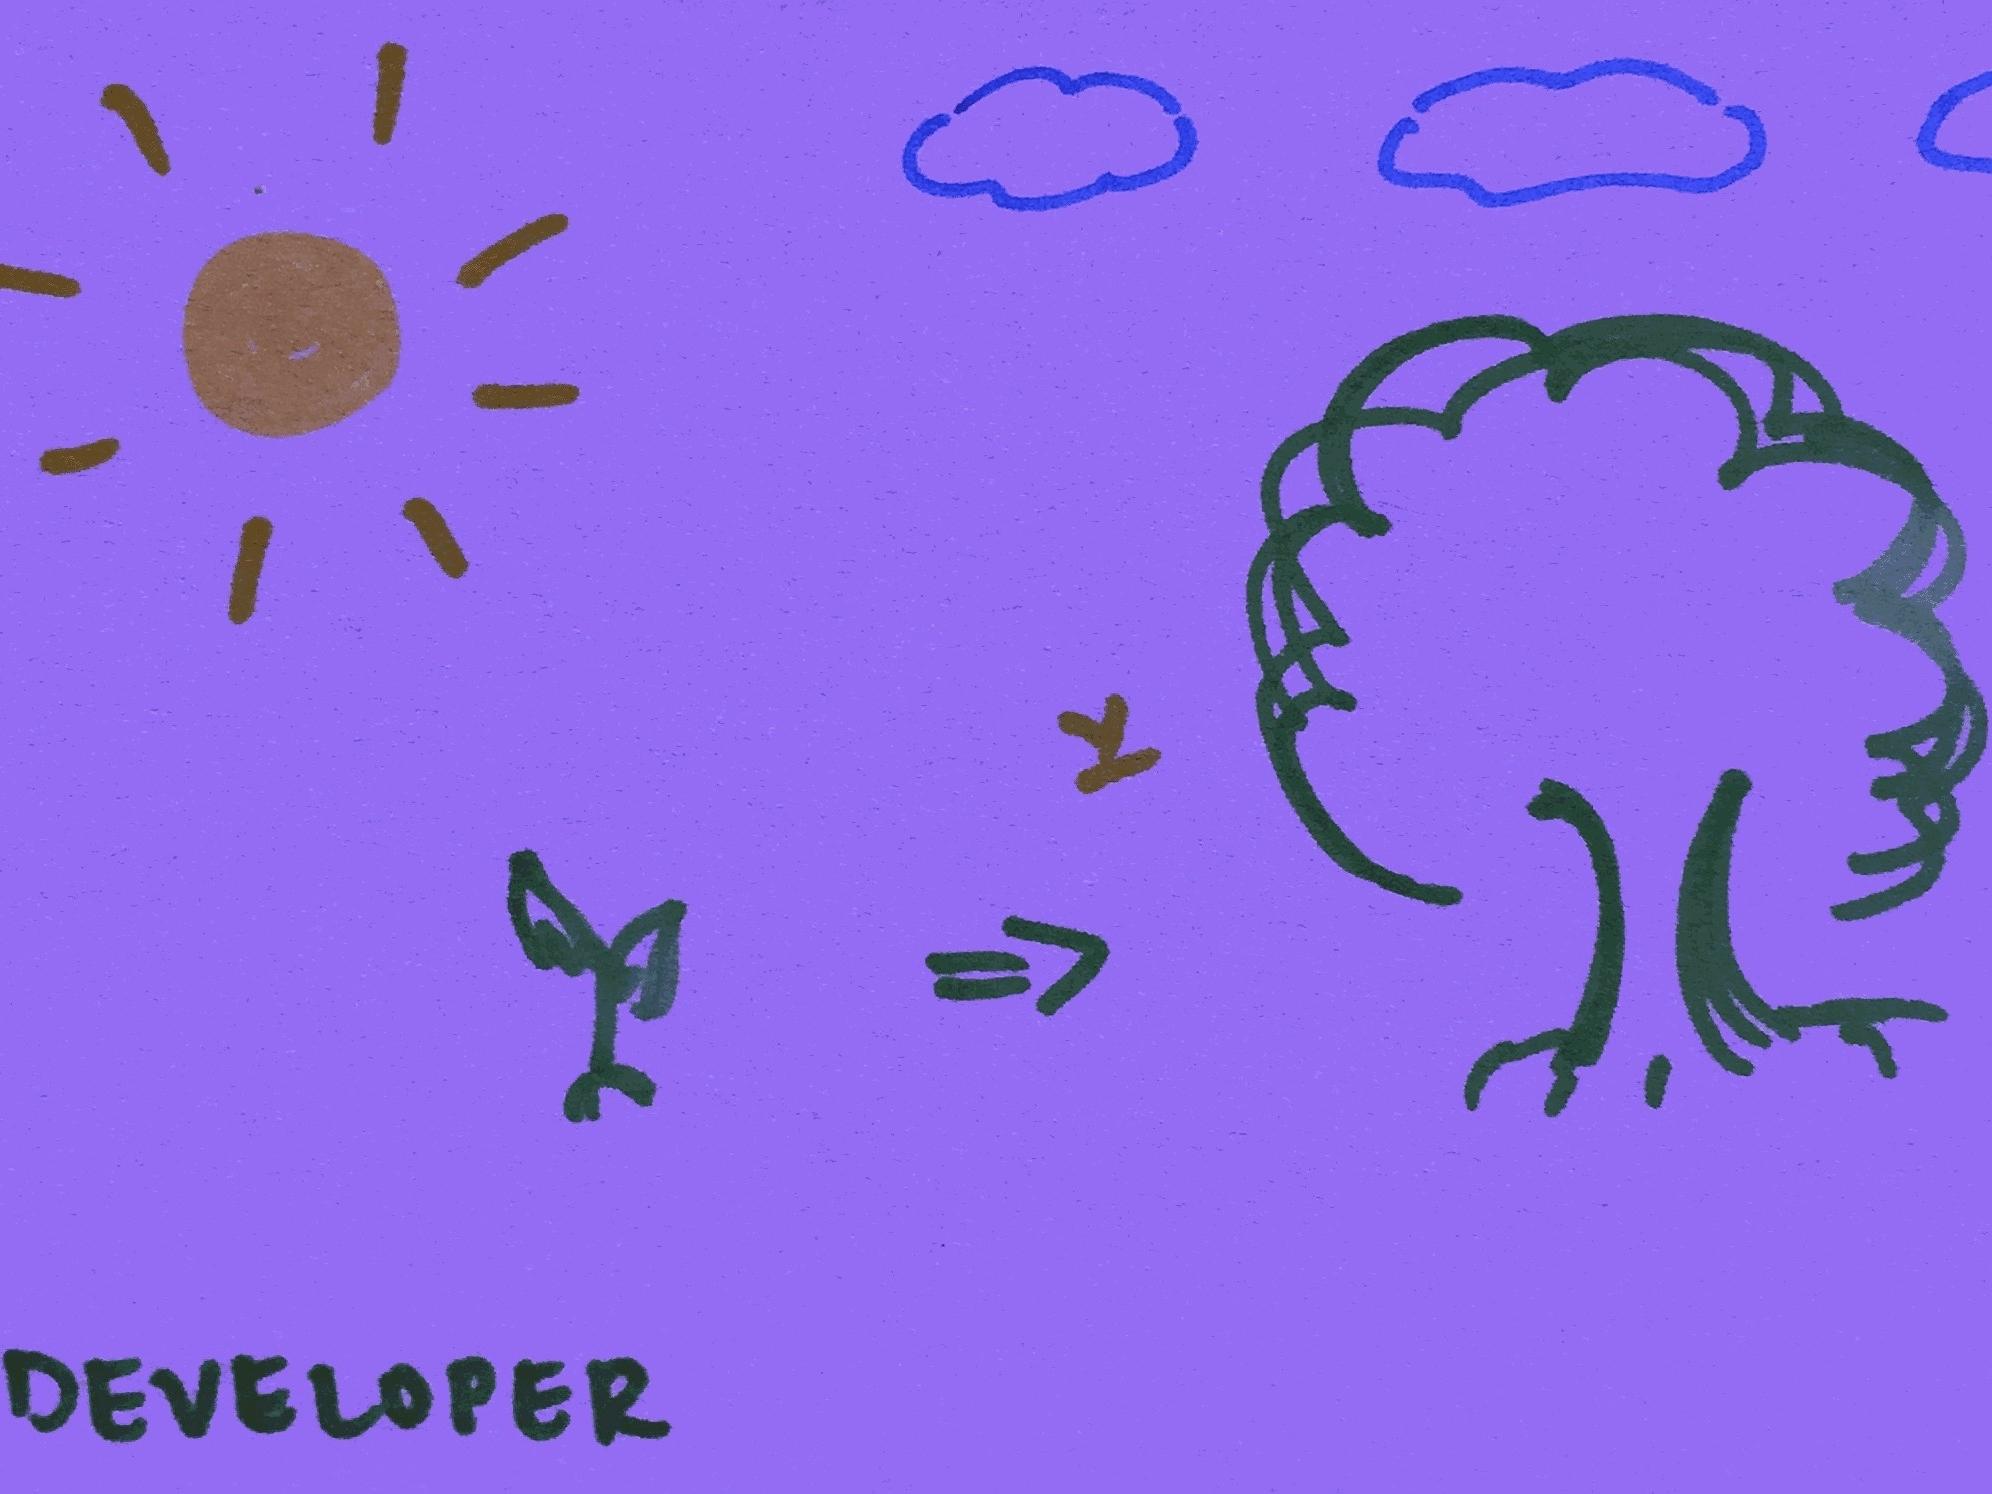 Developer Strengthsfinder Sapling Grow Tree